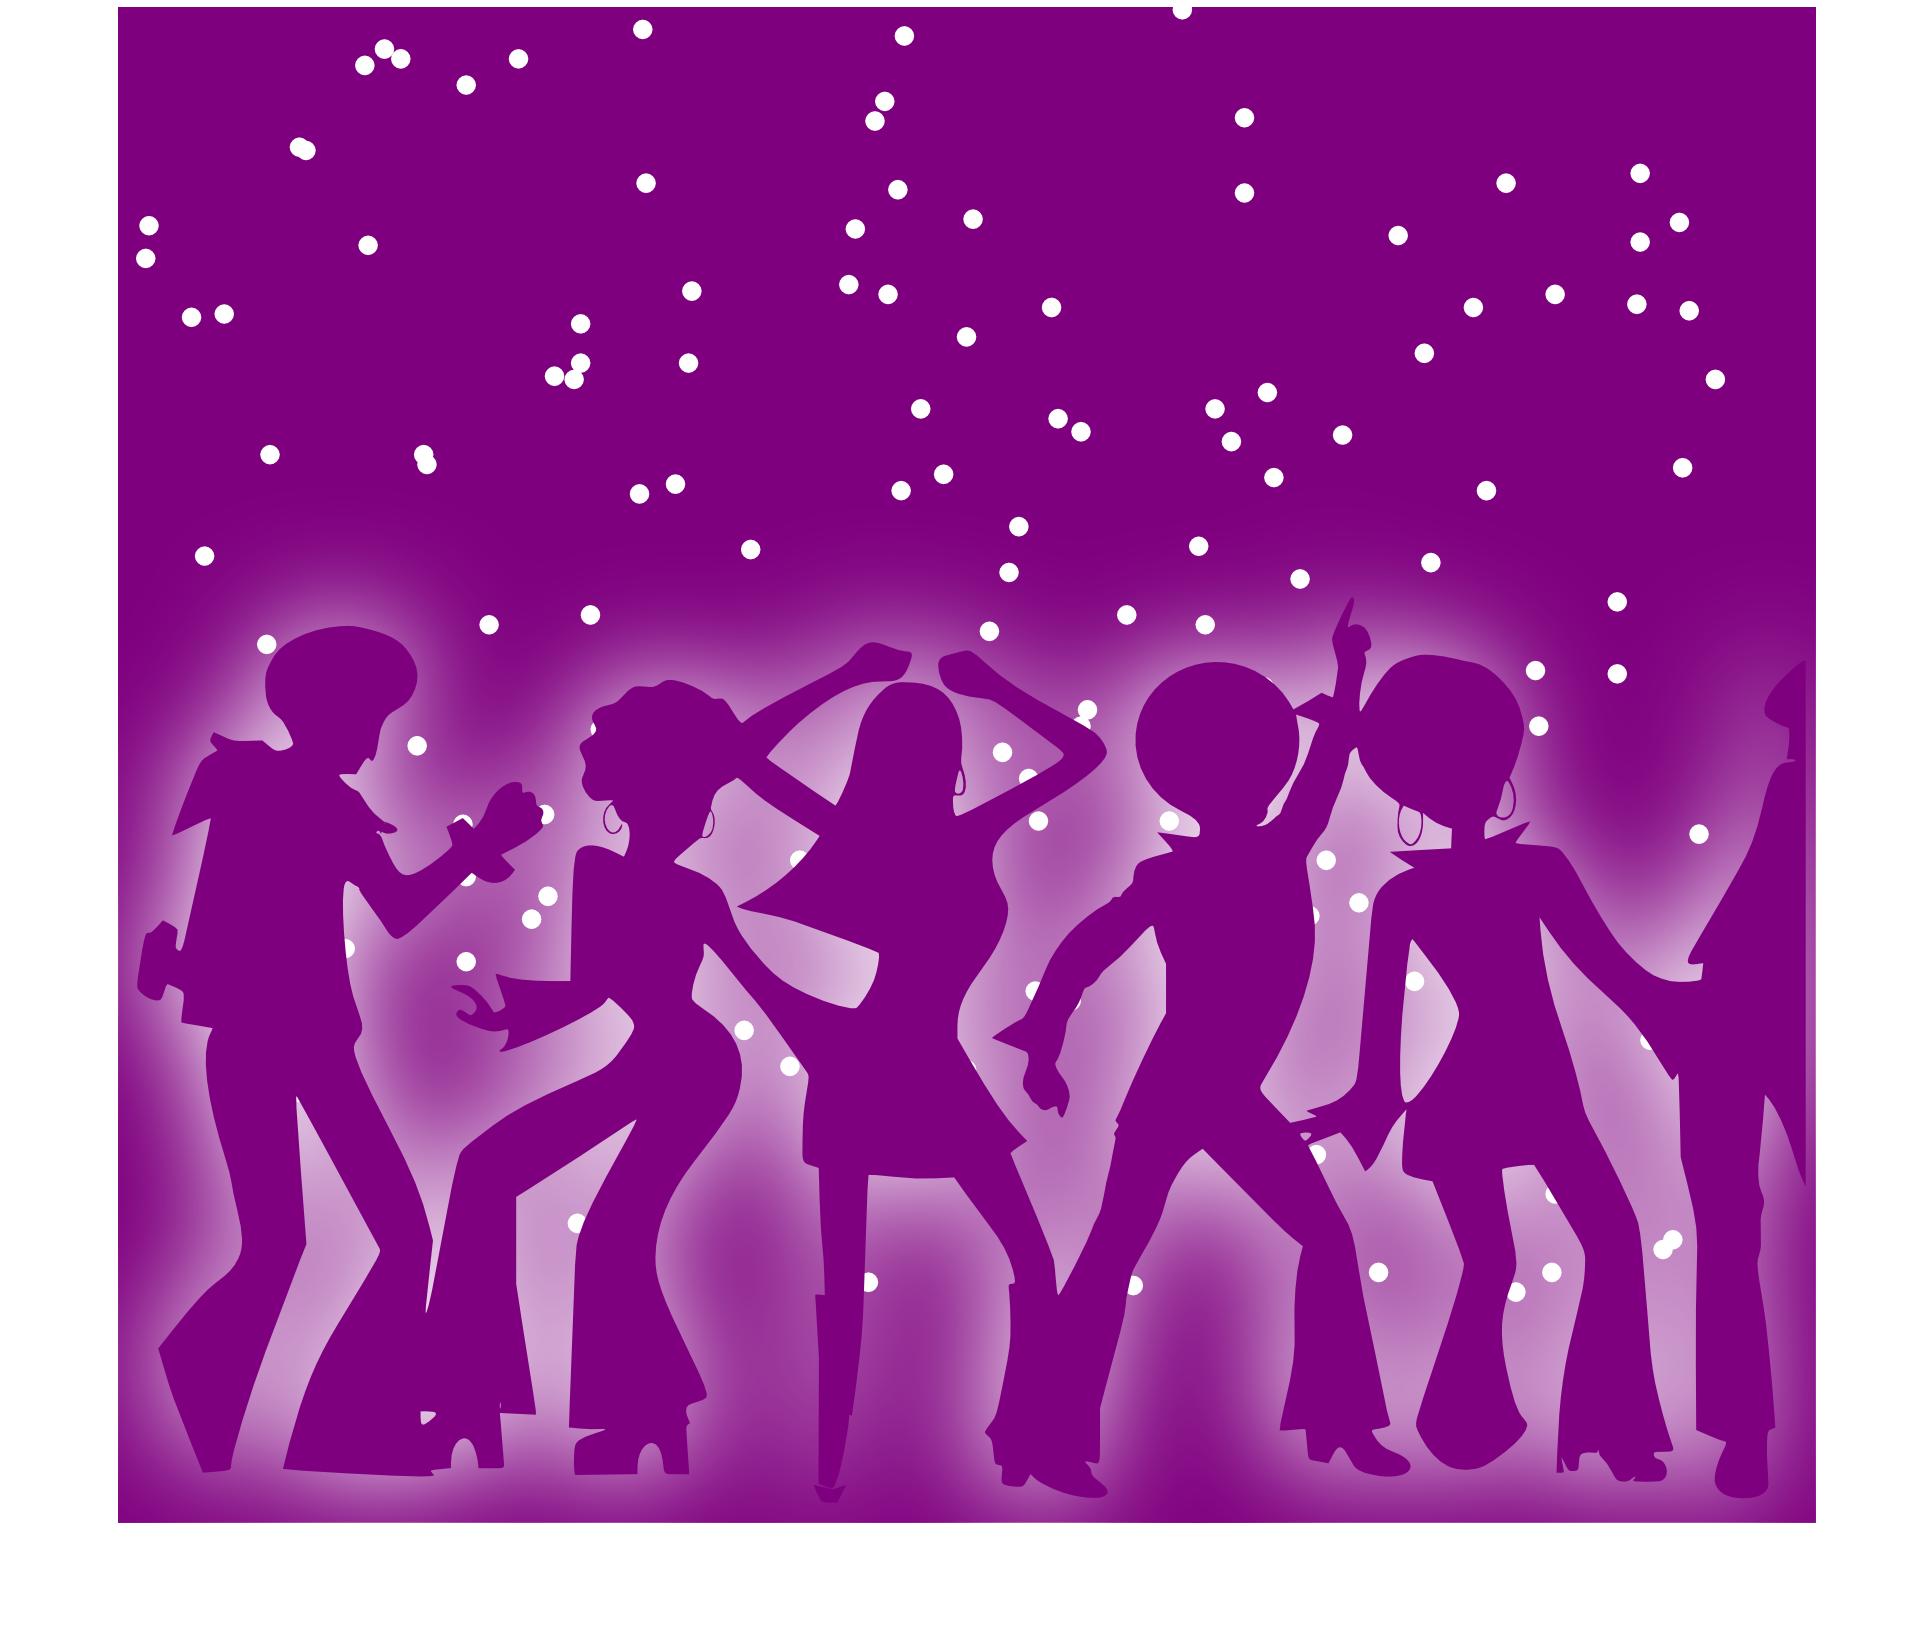 Юбилею, картинки детские танцы для афиши